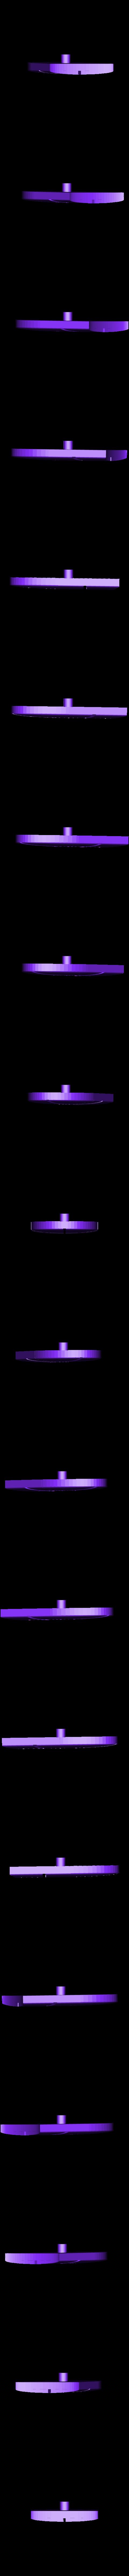 Steam_Shield.stl Download free STL file Modular Mech SteamPunk • Design to 3D print, mrhers2